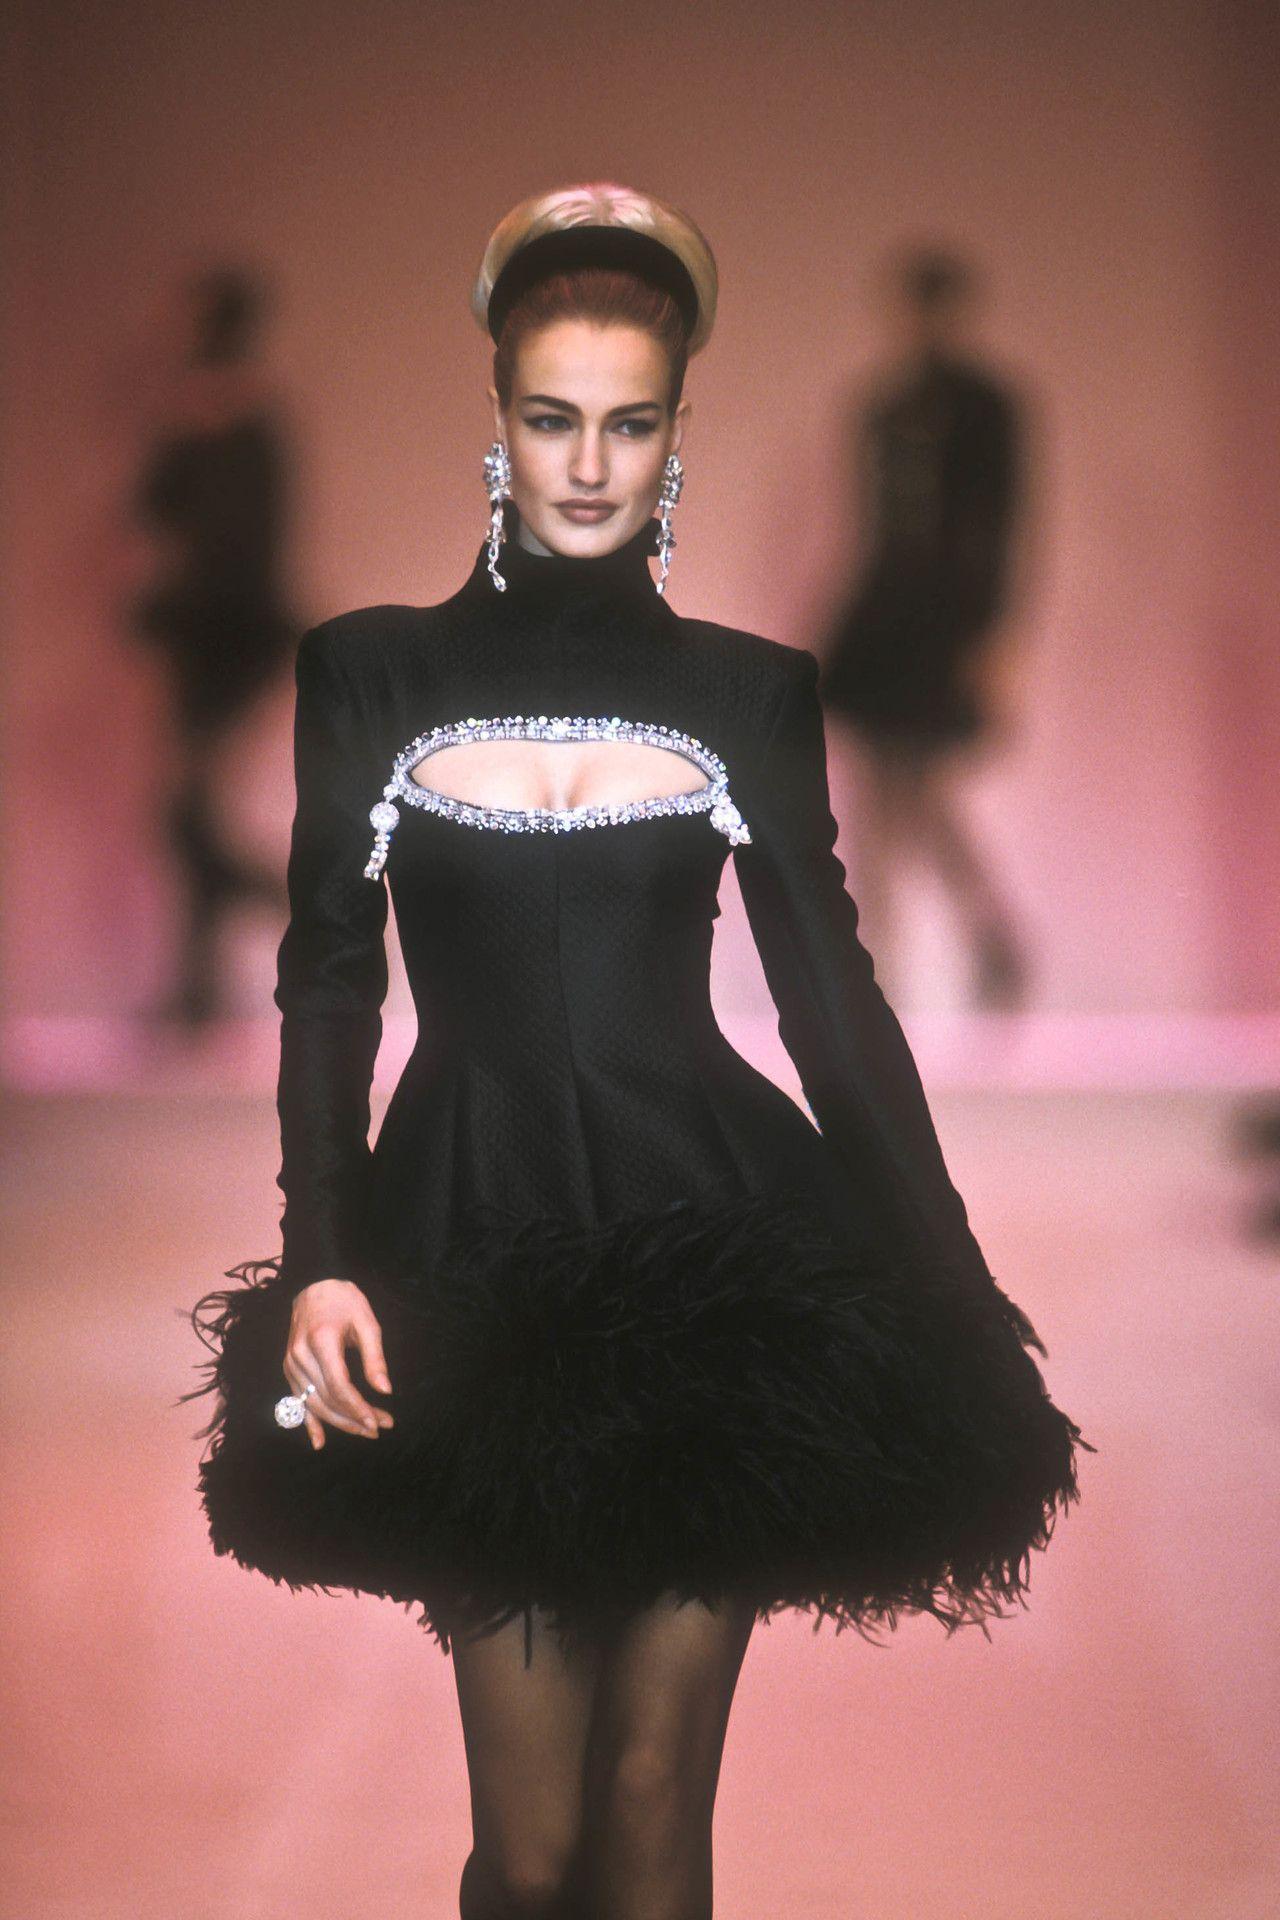 Karen Mulder at Chloé F/W 1991 - #90s #chloe #details #karen #Mulder #runway